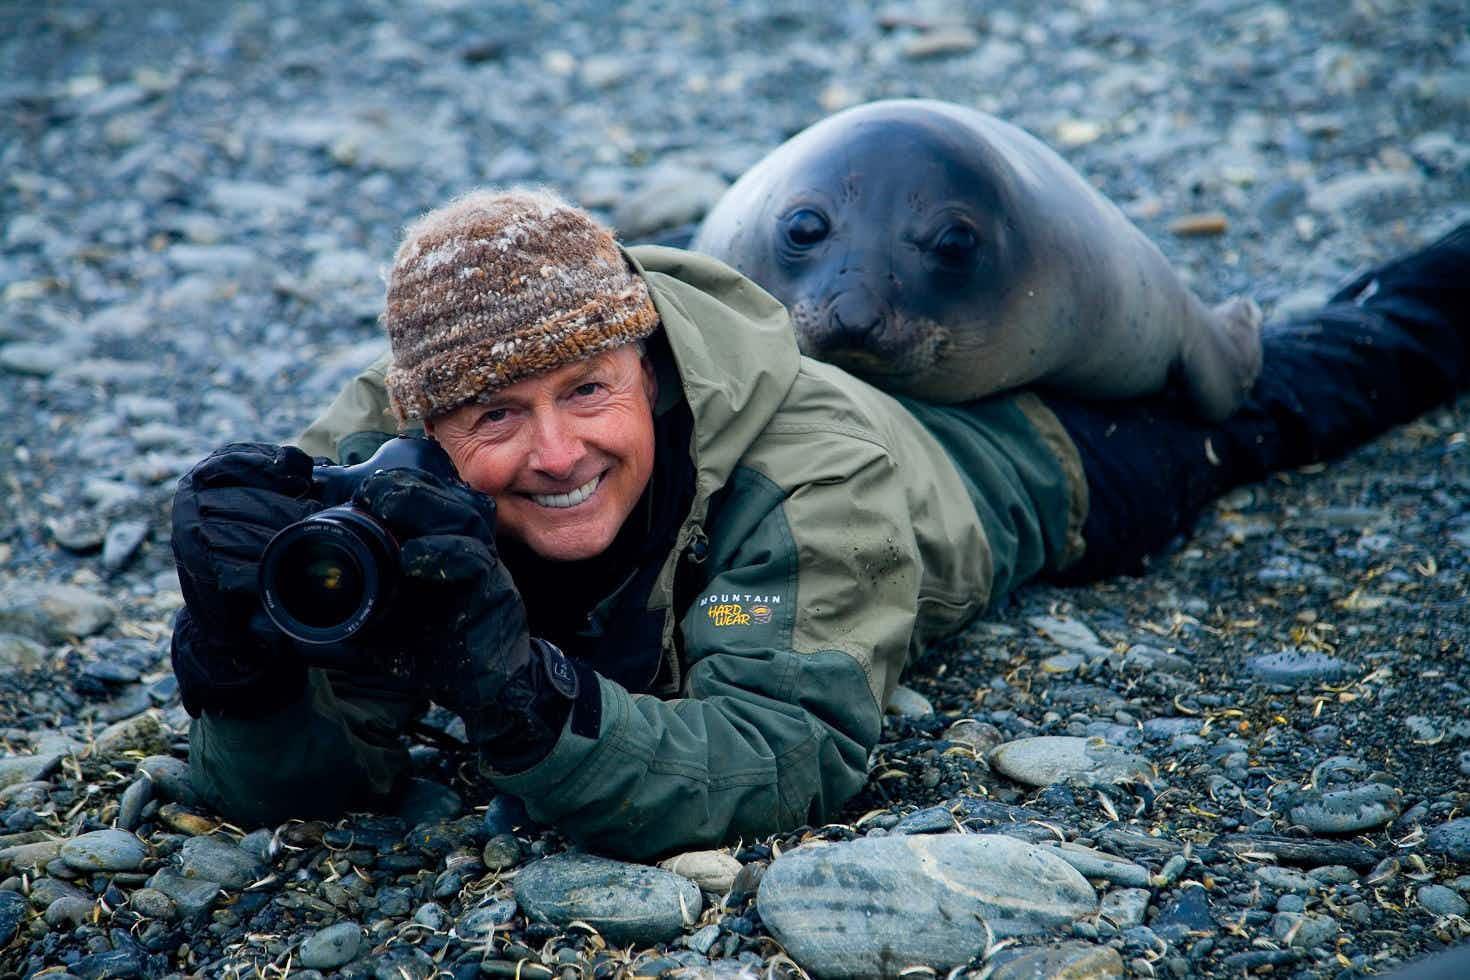 Meet a traveller: Art Wolfe, photographer and conservationist